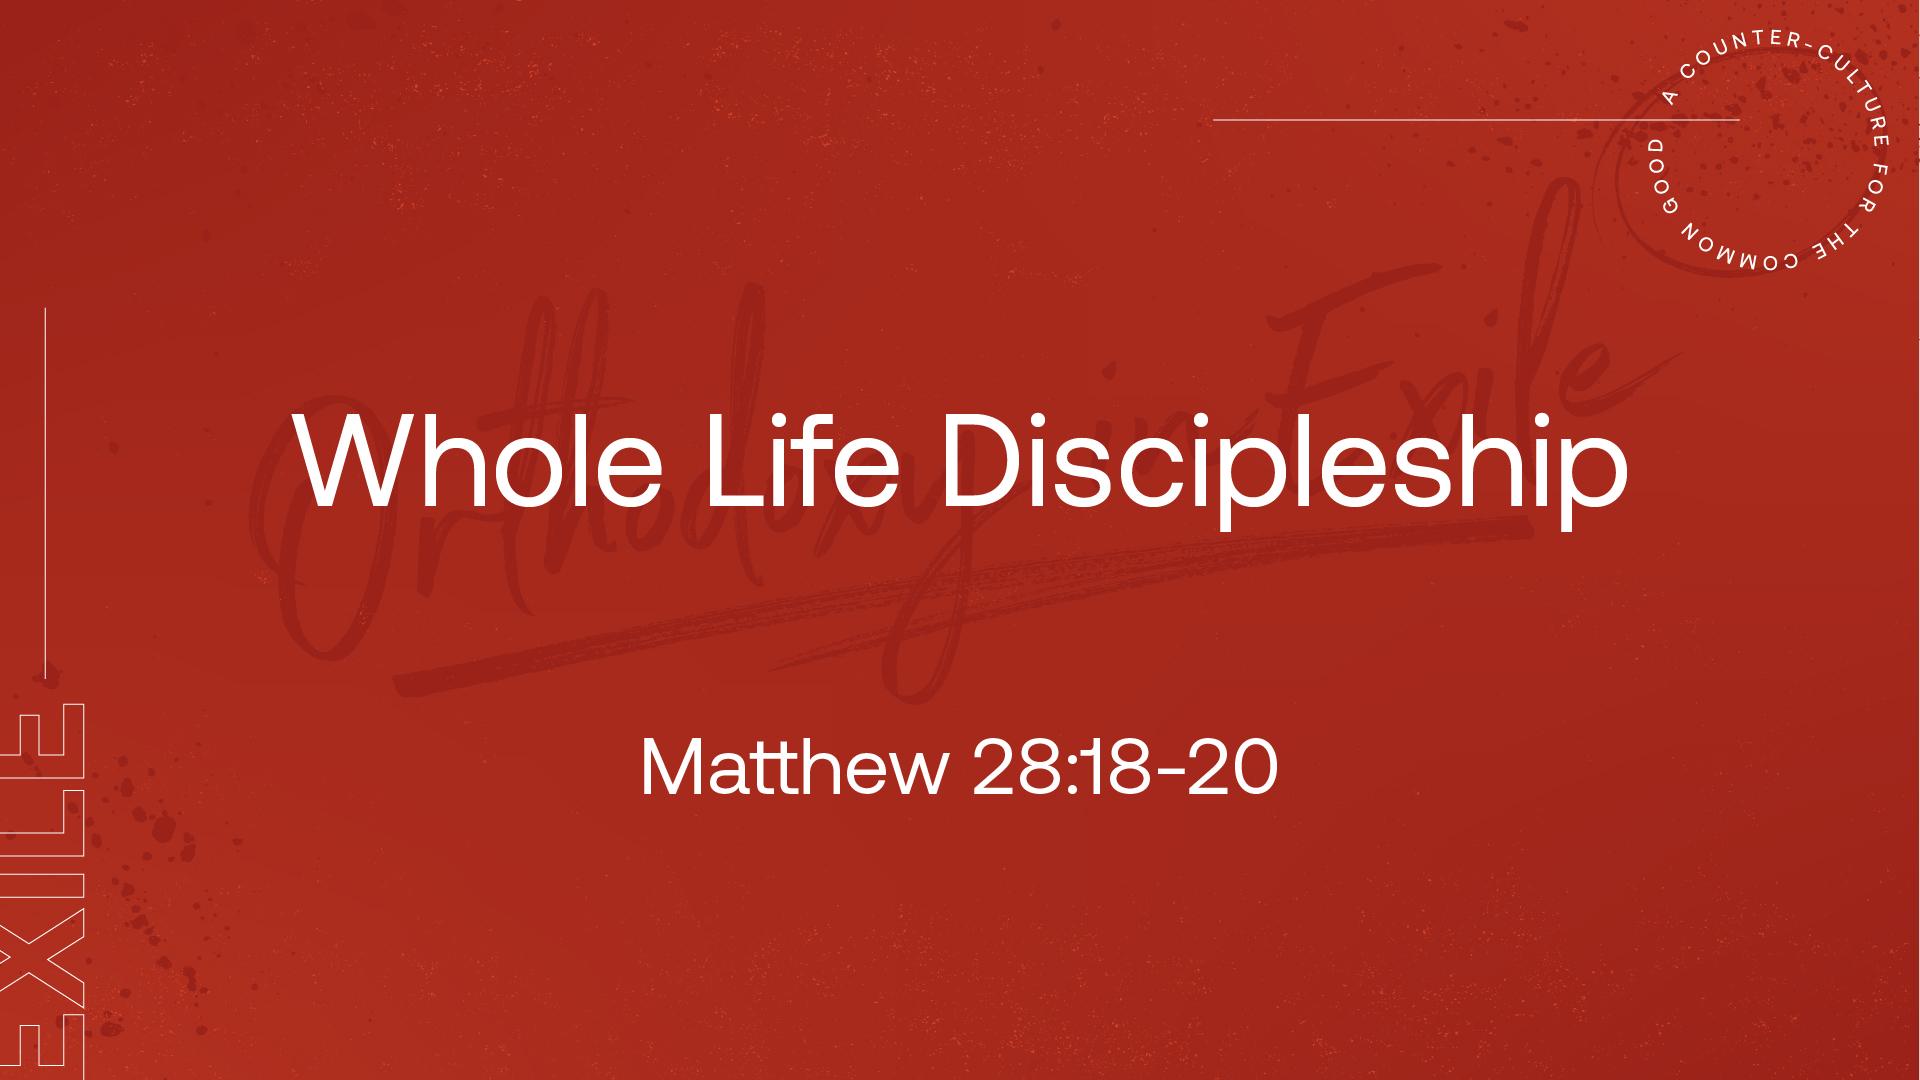 Whole Life Discipleship